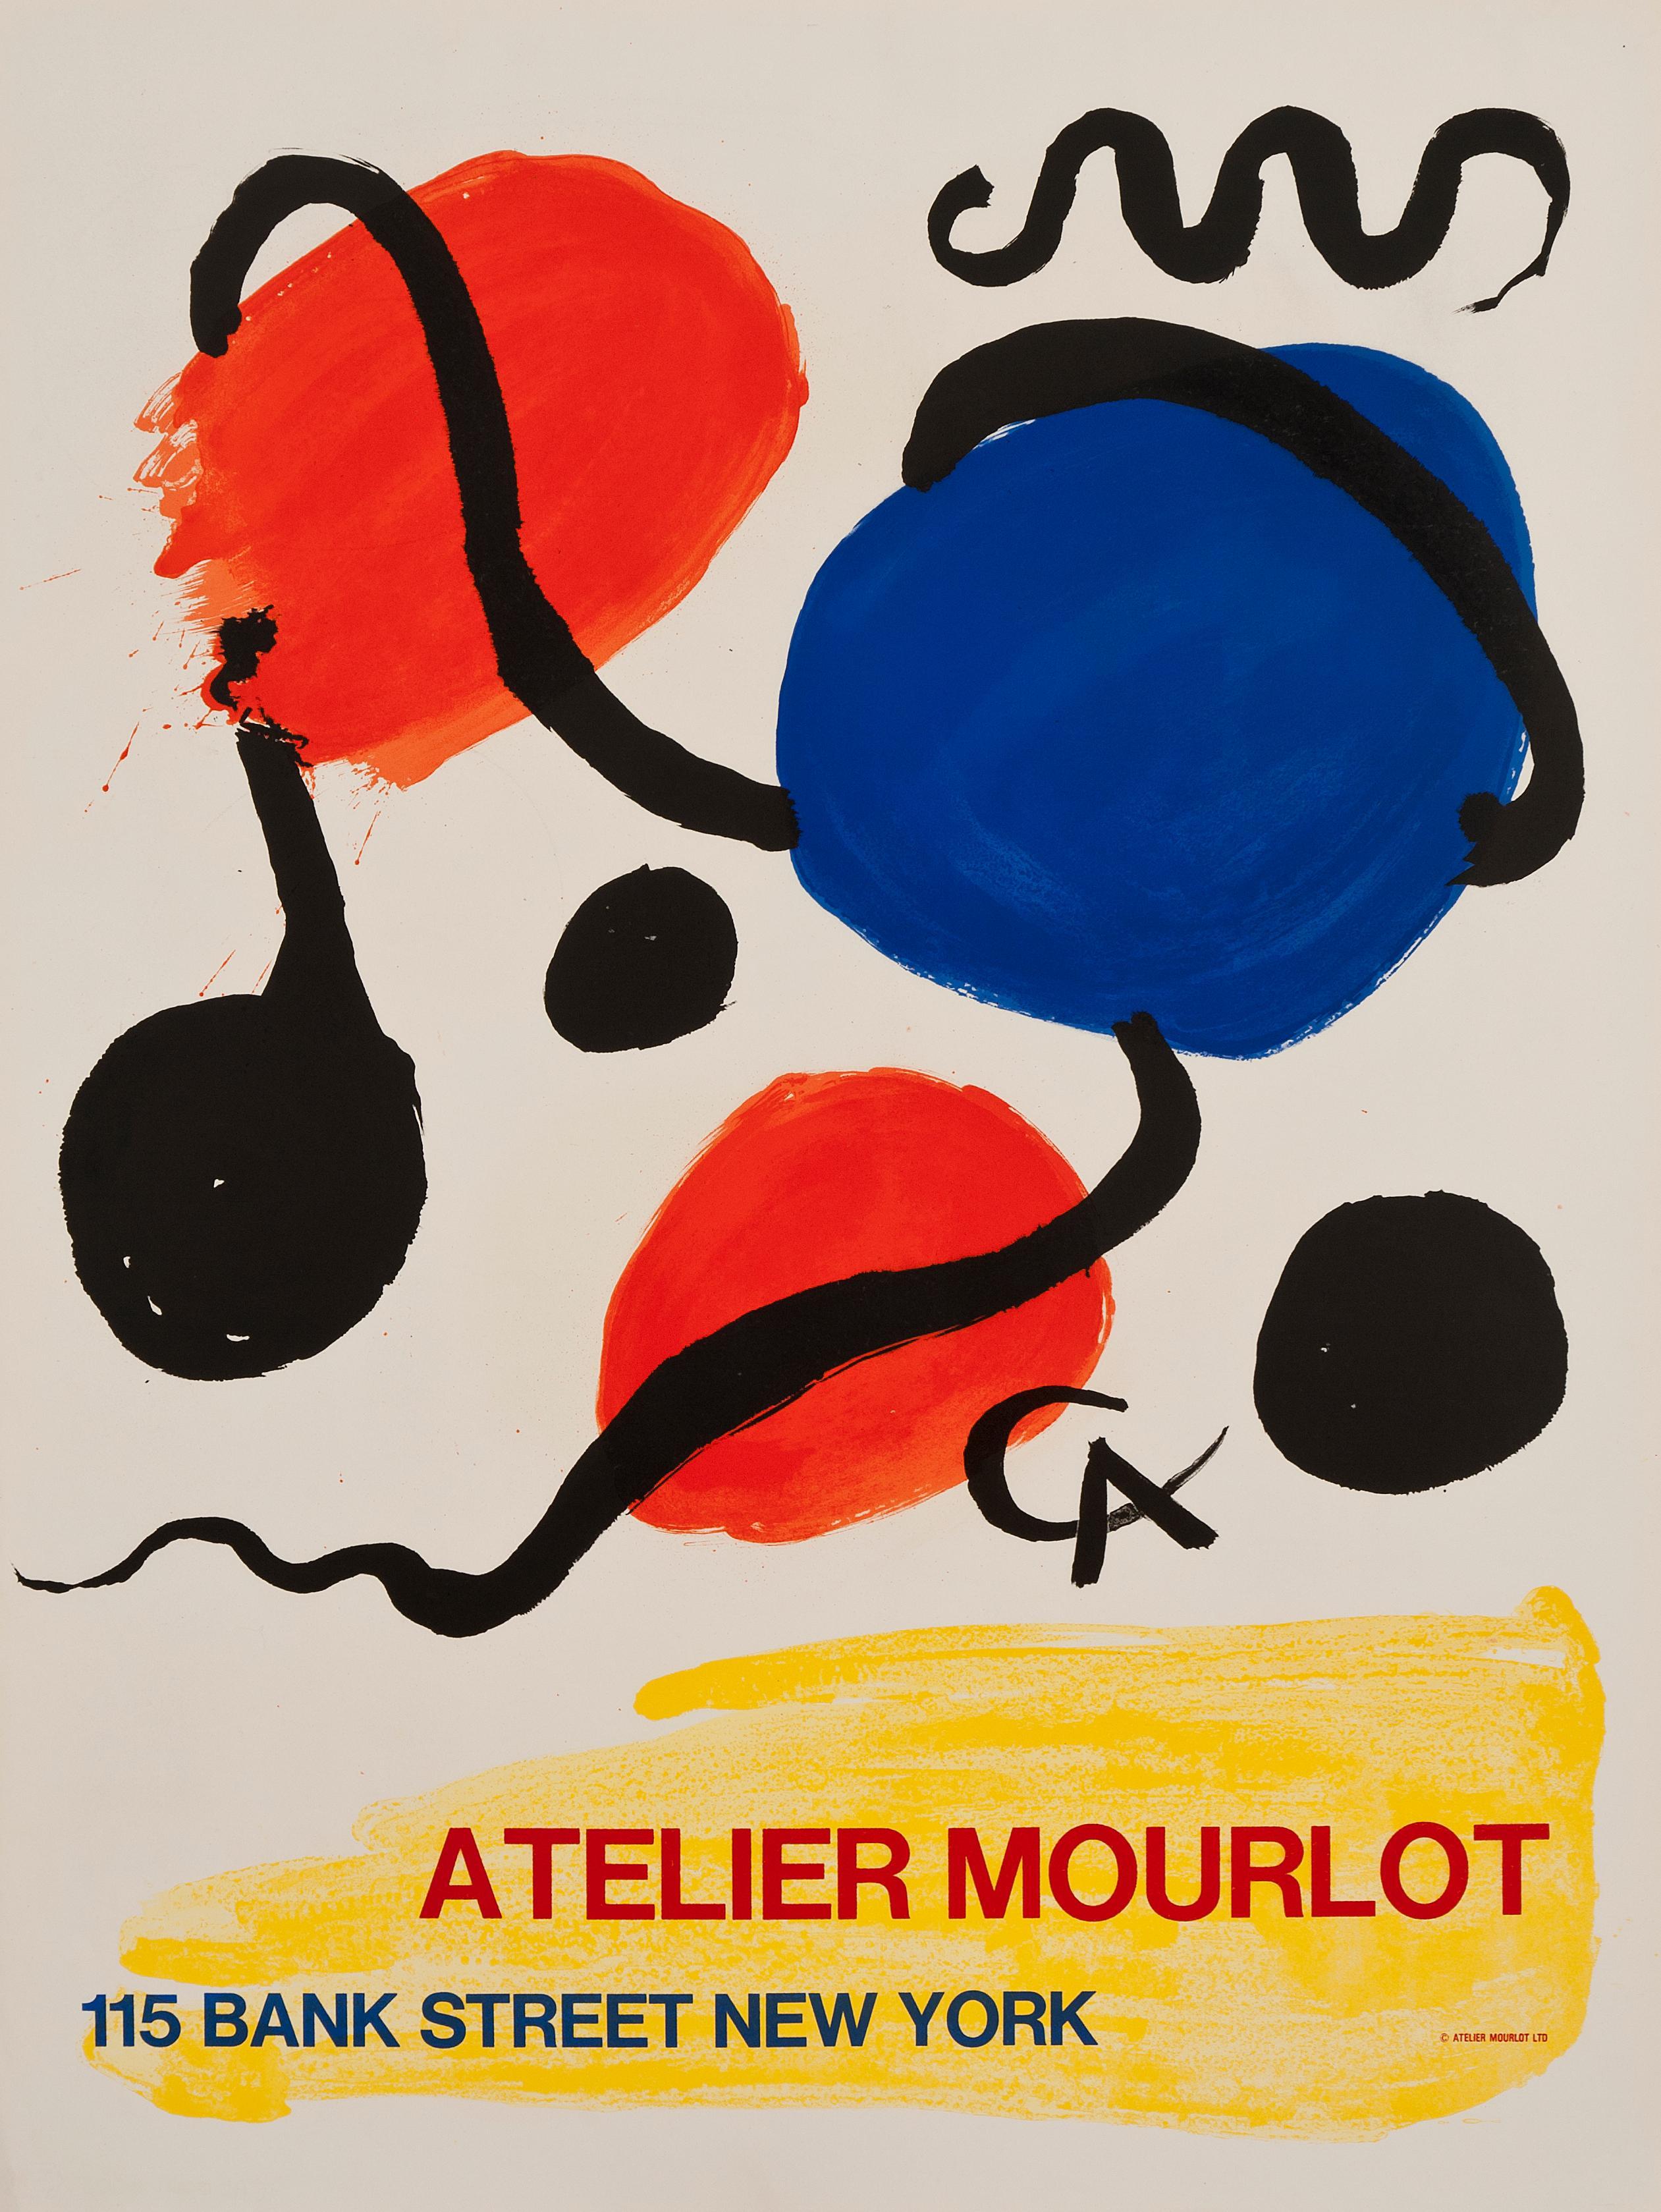 Atelier Mourlot by Alexander Calder, 1967 Original Lithographic poster